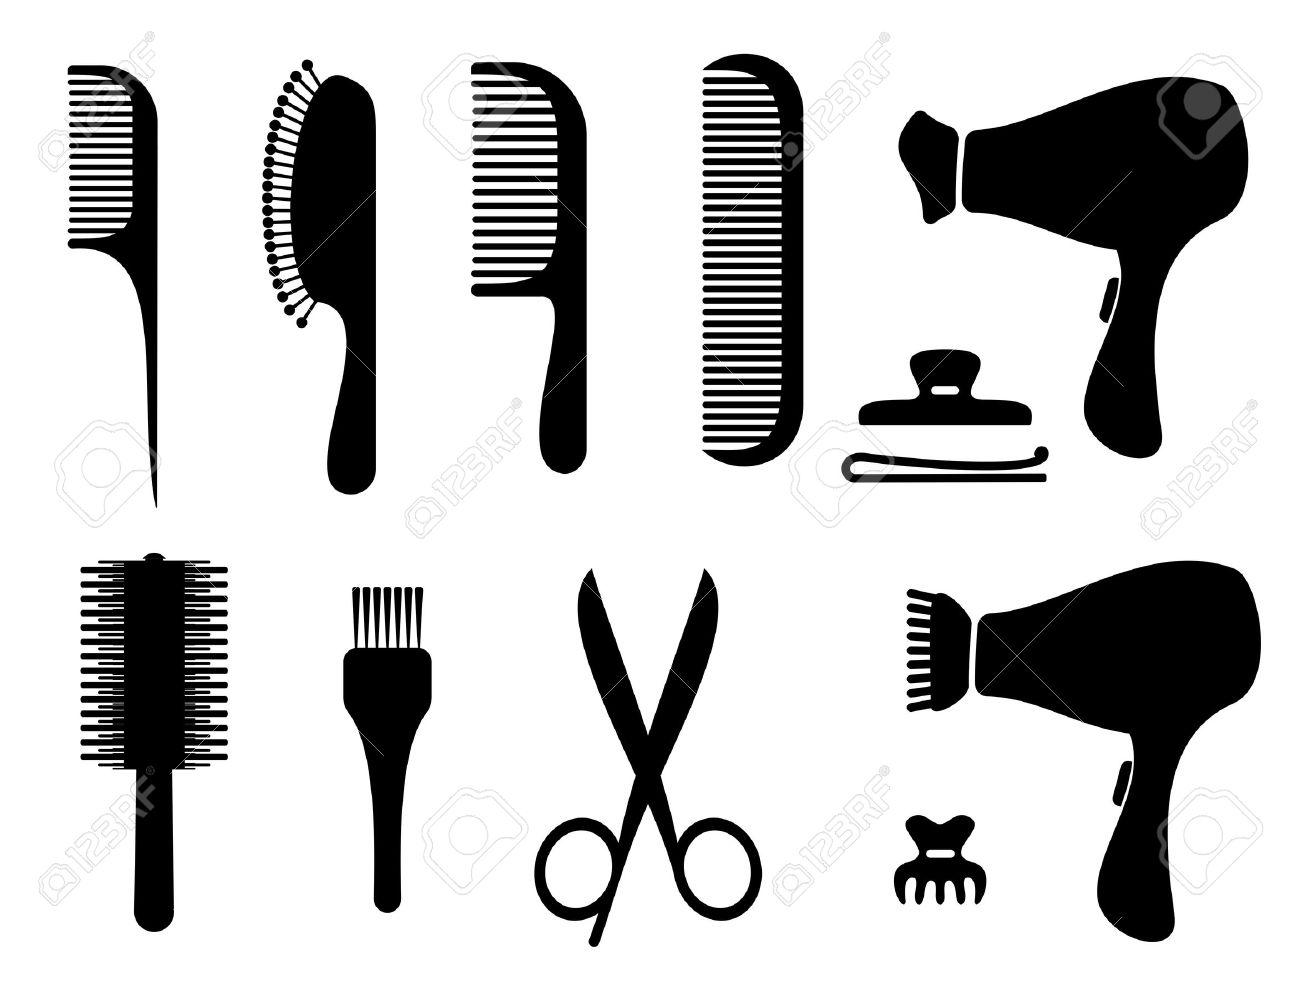 Hair clipart parlor #6